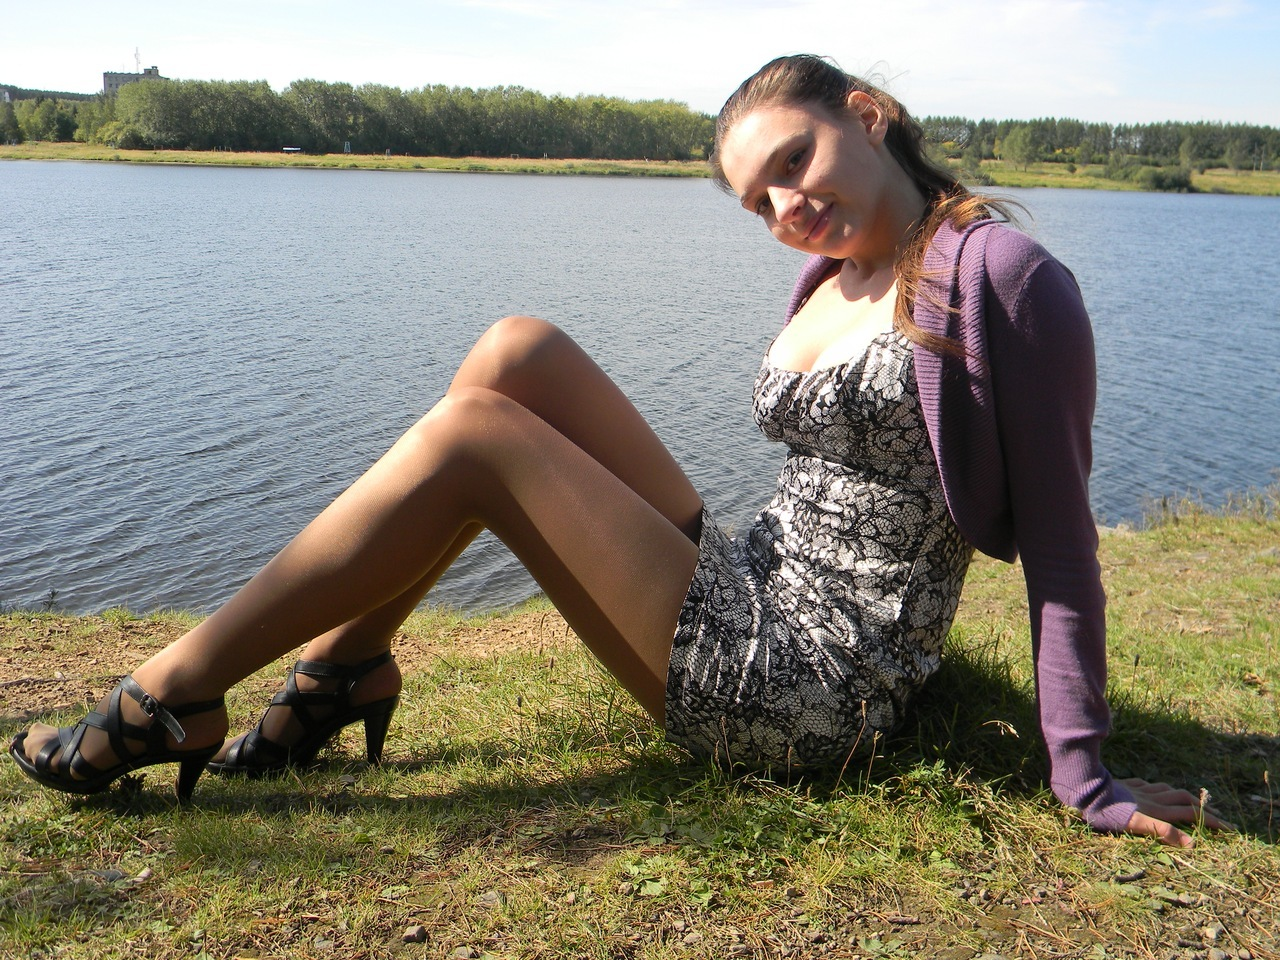 Симпатичная девушка на берегу озера в колготках